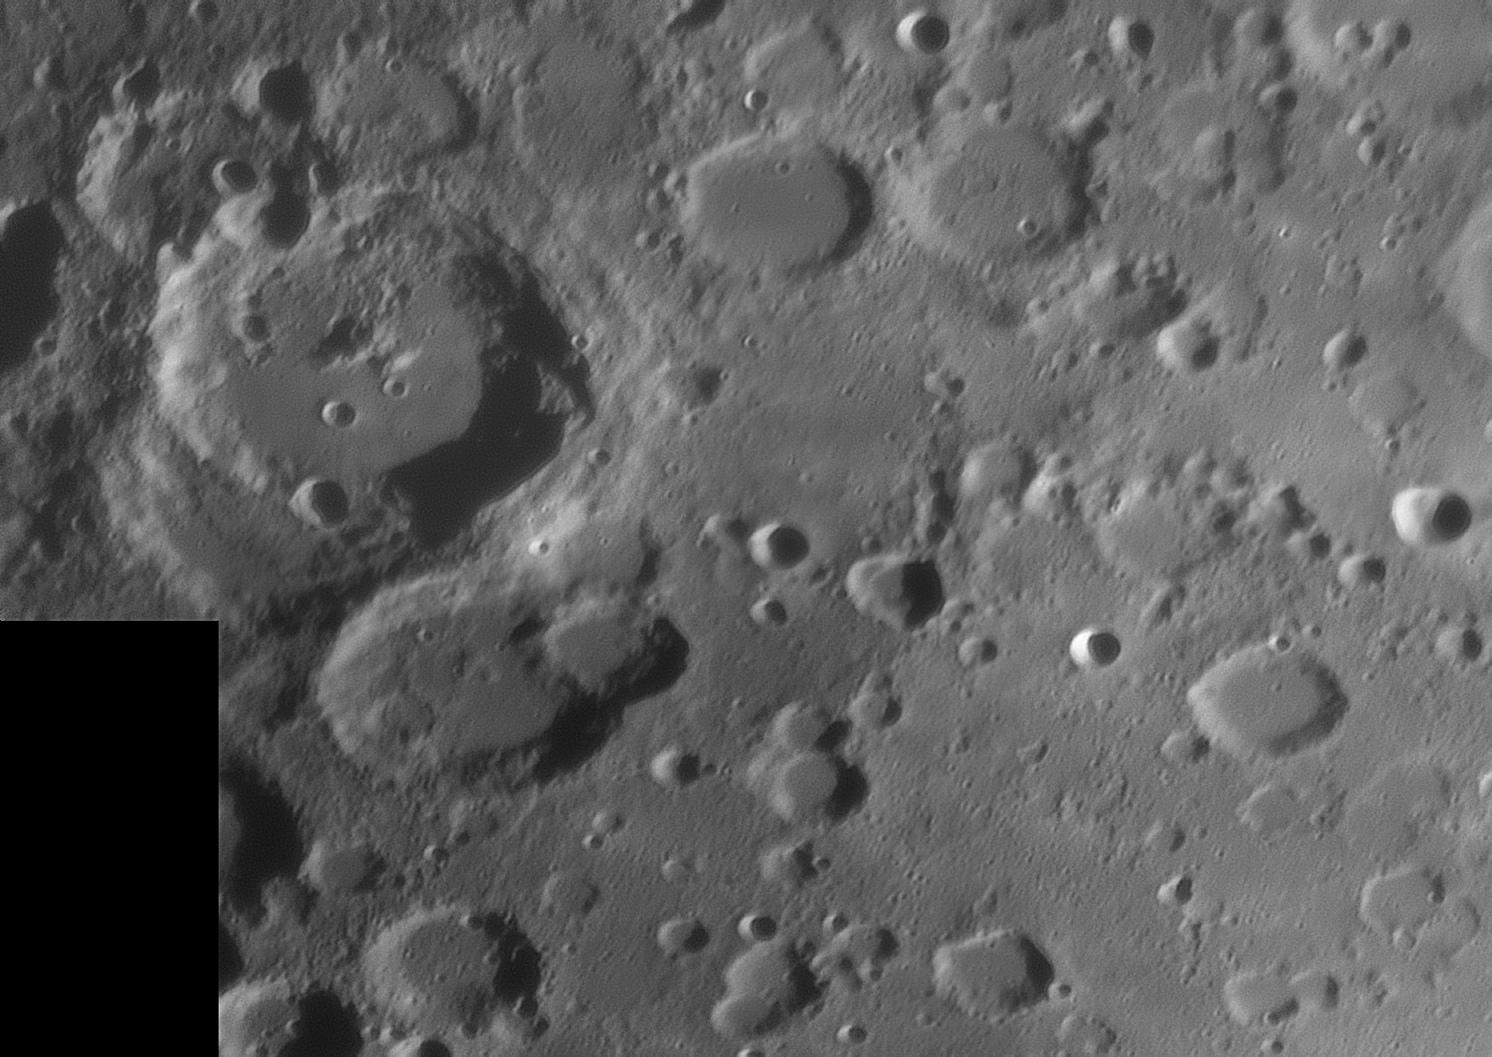 lune3.jpg.3af199467353d6d012b94df5f01d21eb.jpg